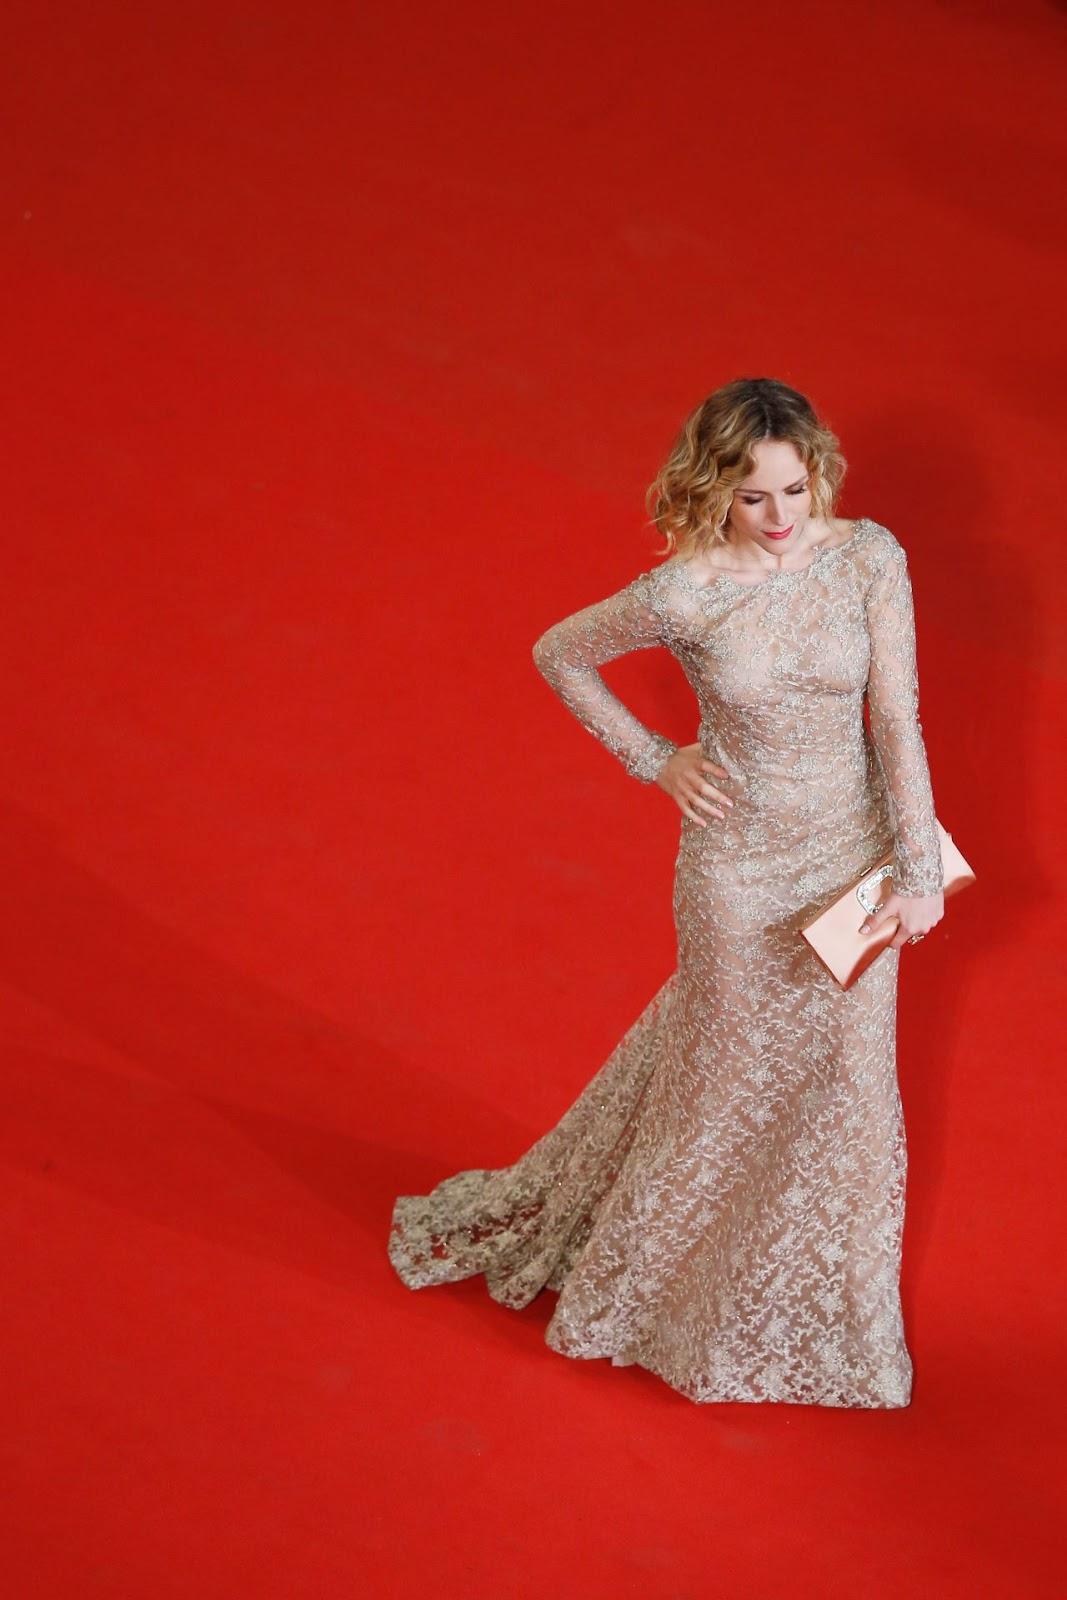 Full HQ Photos of Italian Actress 'Tatiana Luter' Il Racconto Dei Racconti Premiere At 2015 Cannes Film Festival